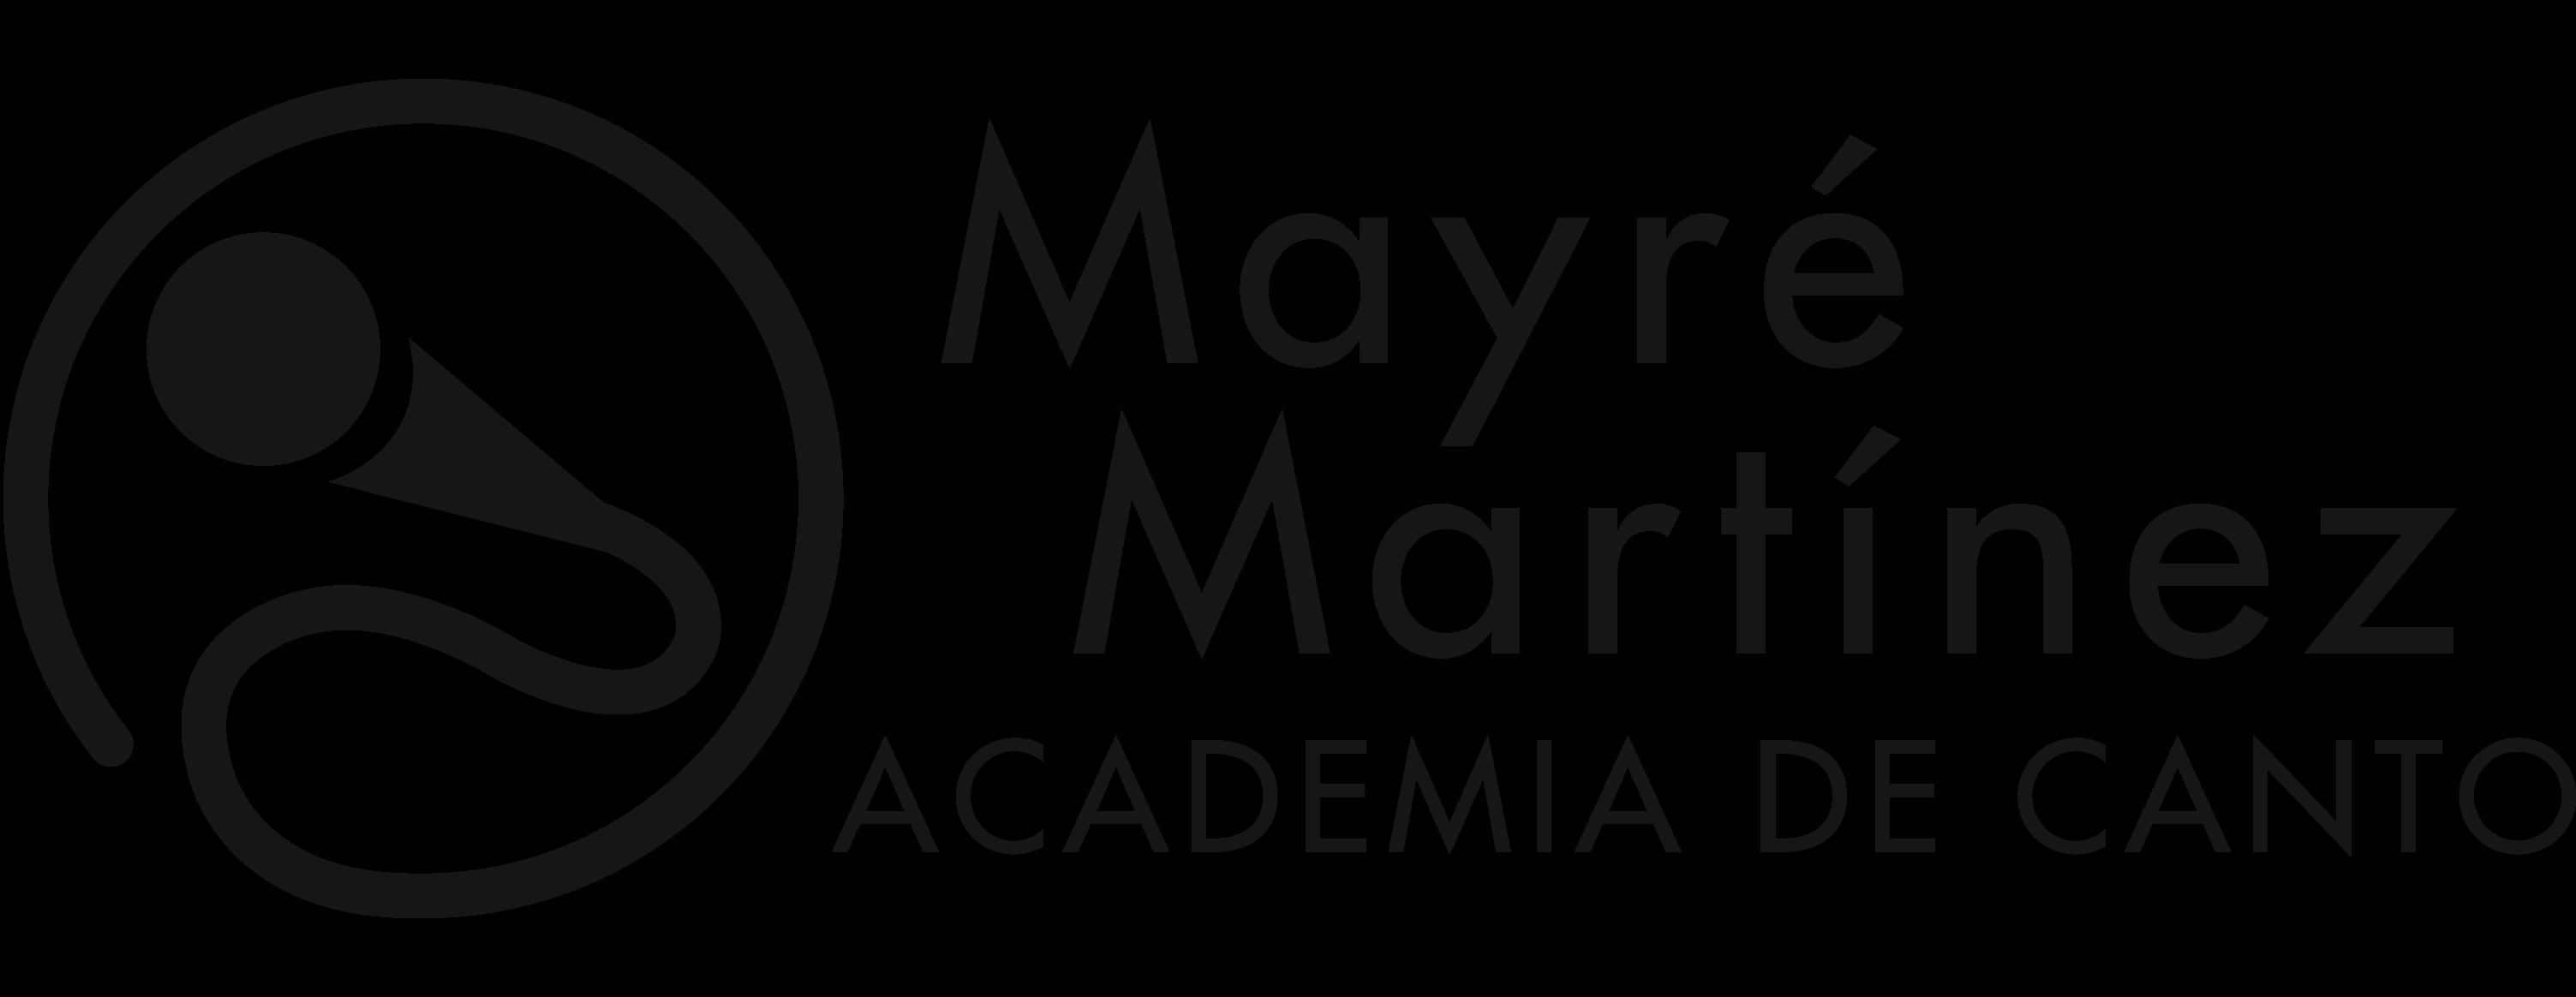 Mayré Martínez Academia de Canto